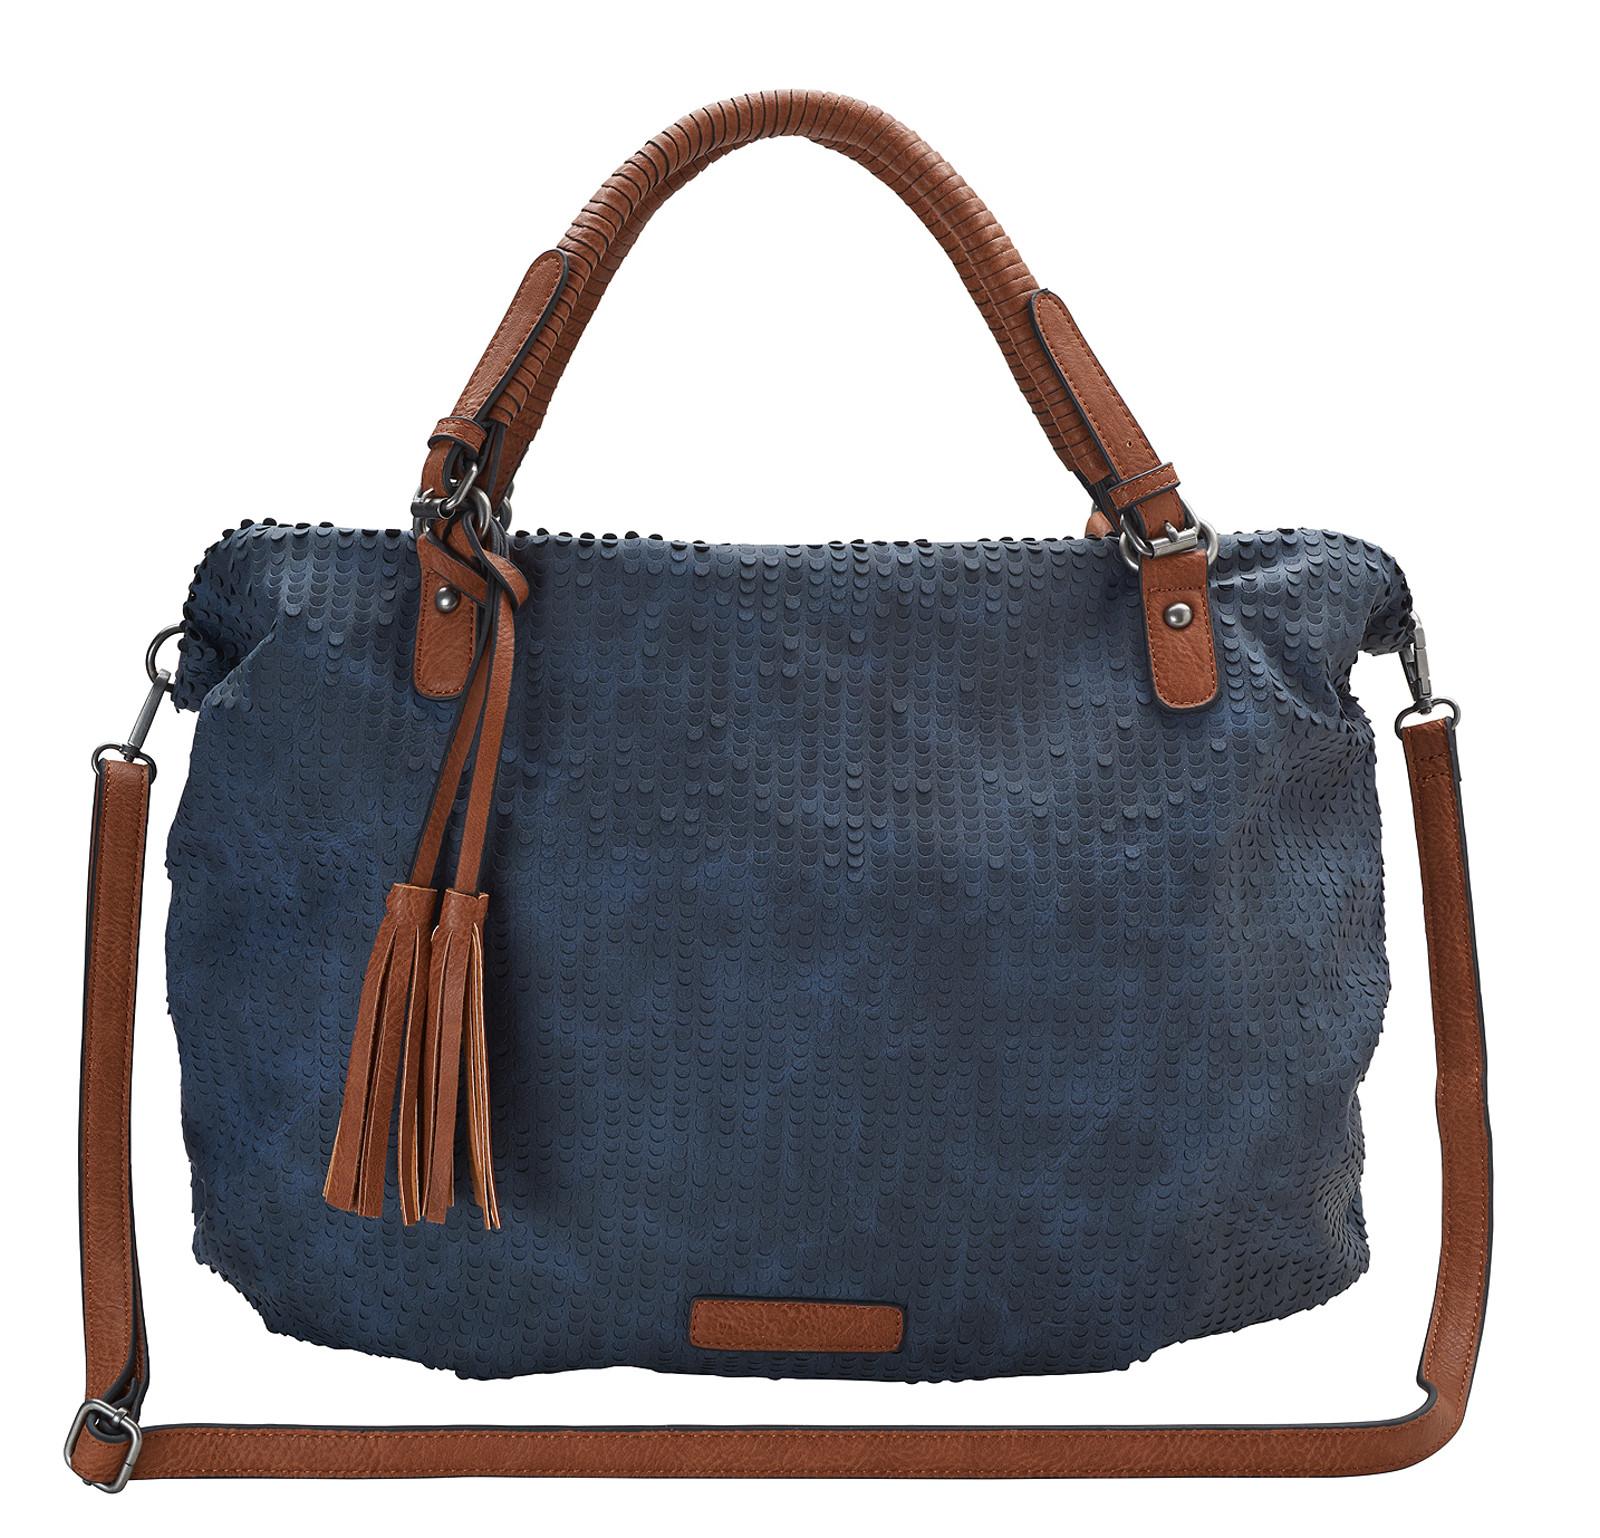 3230e494dc218 Marco Tozzi Handtasche Schultertasche Shopper 61101